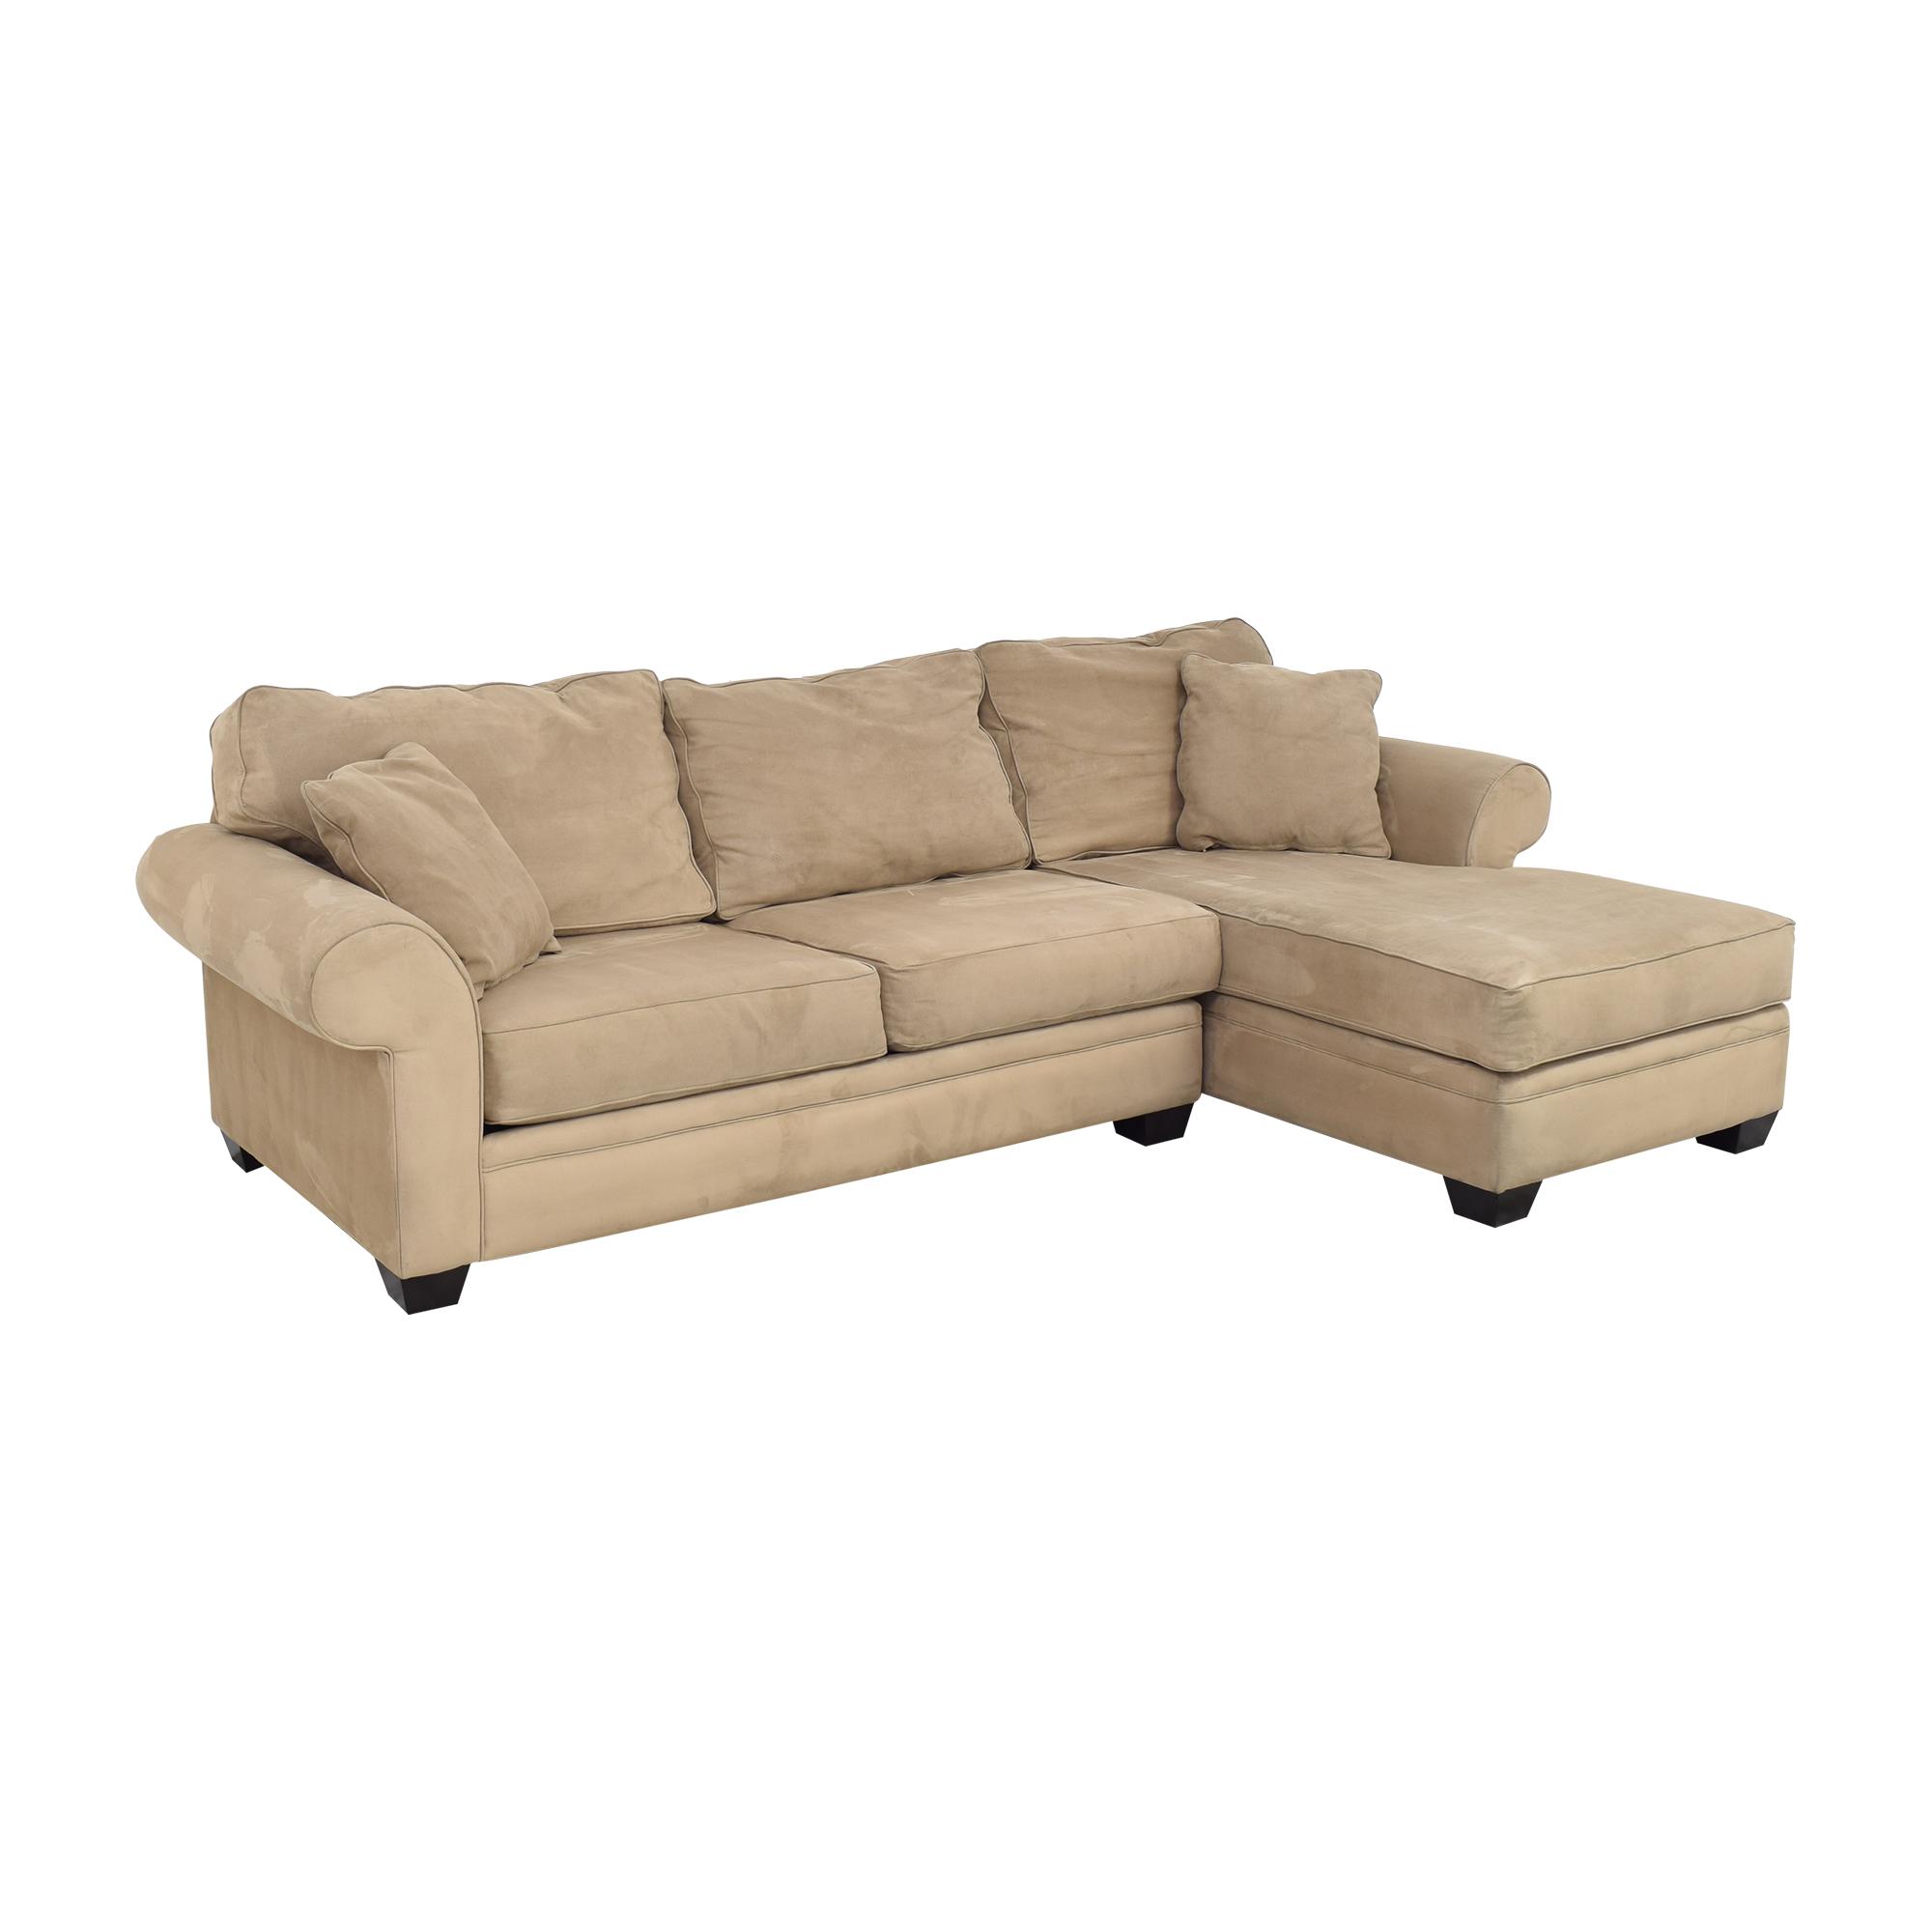 shop Jonathan Louis Chaise Sectional Sofa Macy's